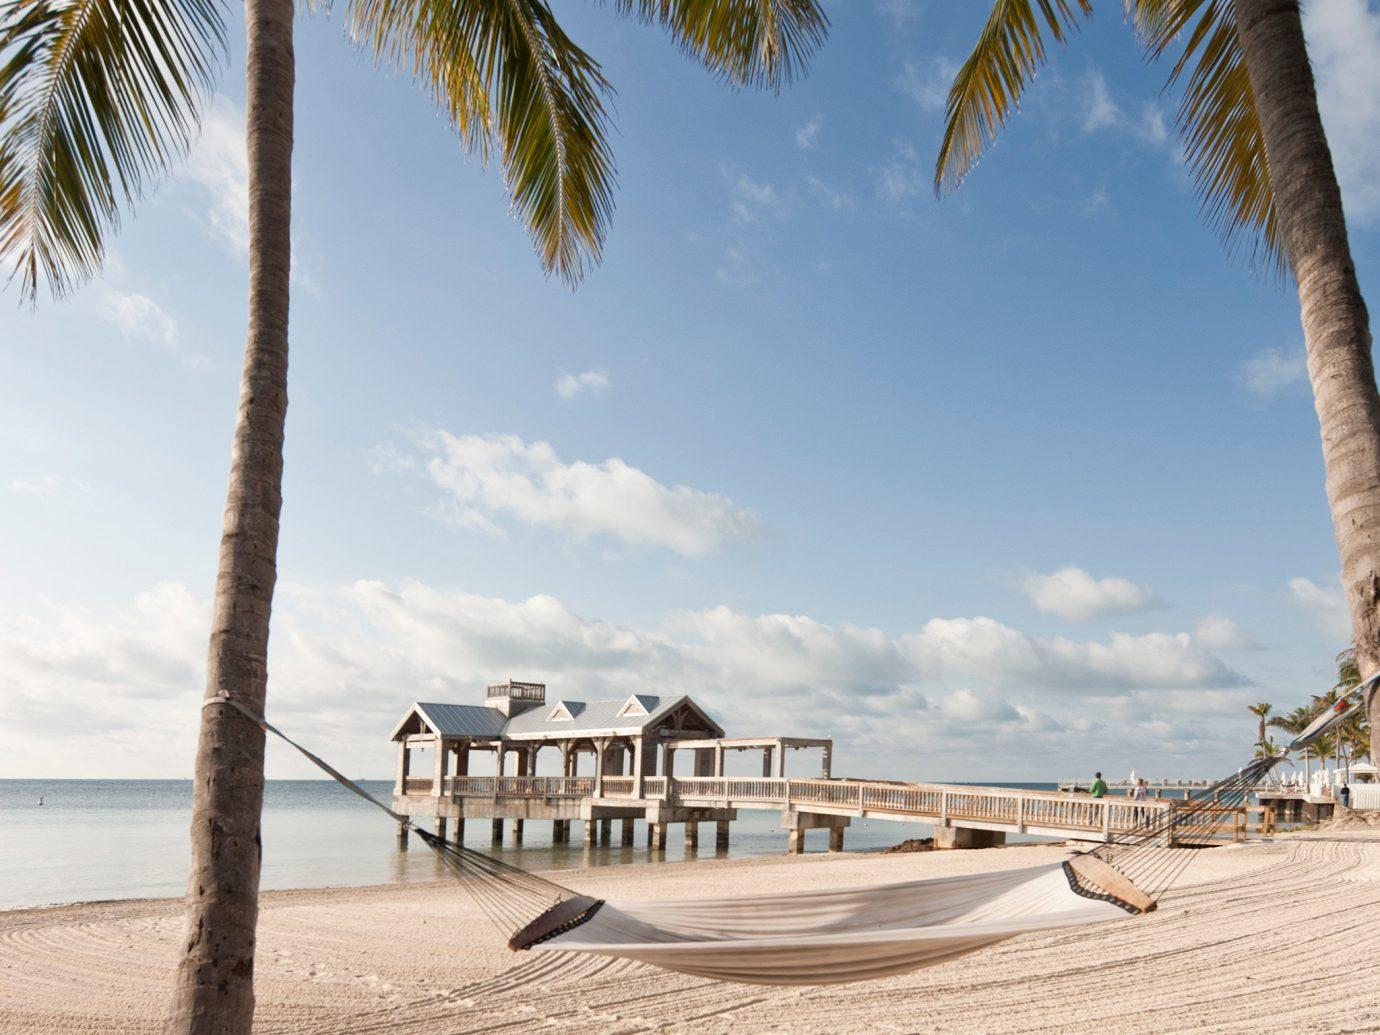 Beach Hotels Ocean sky outdoor tree ground shore body of water Sea plant palm vacation Coast arecales sand caribbean bay palm family Resort sandy sunny shade day